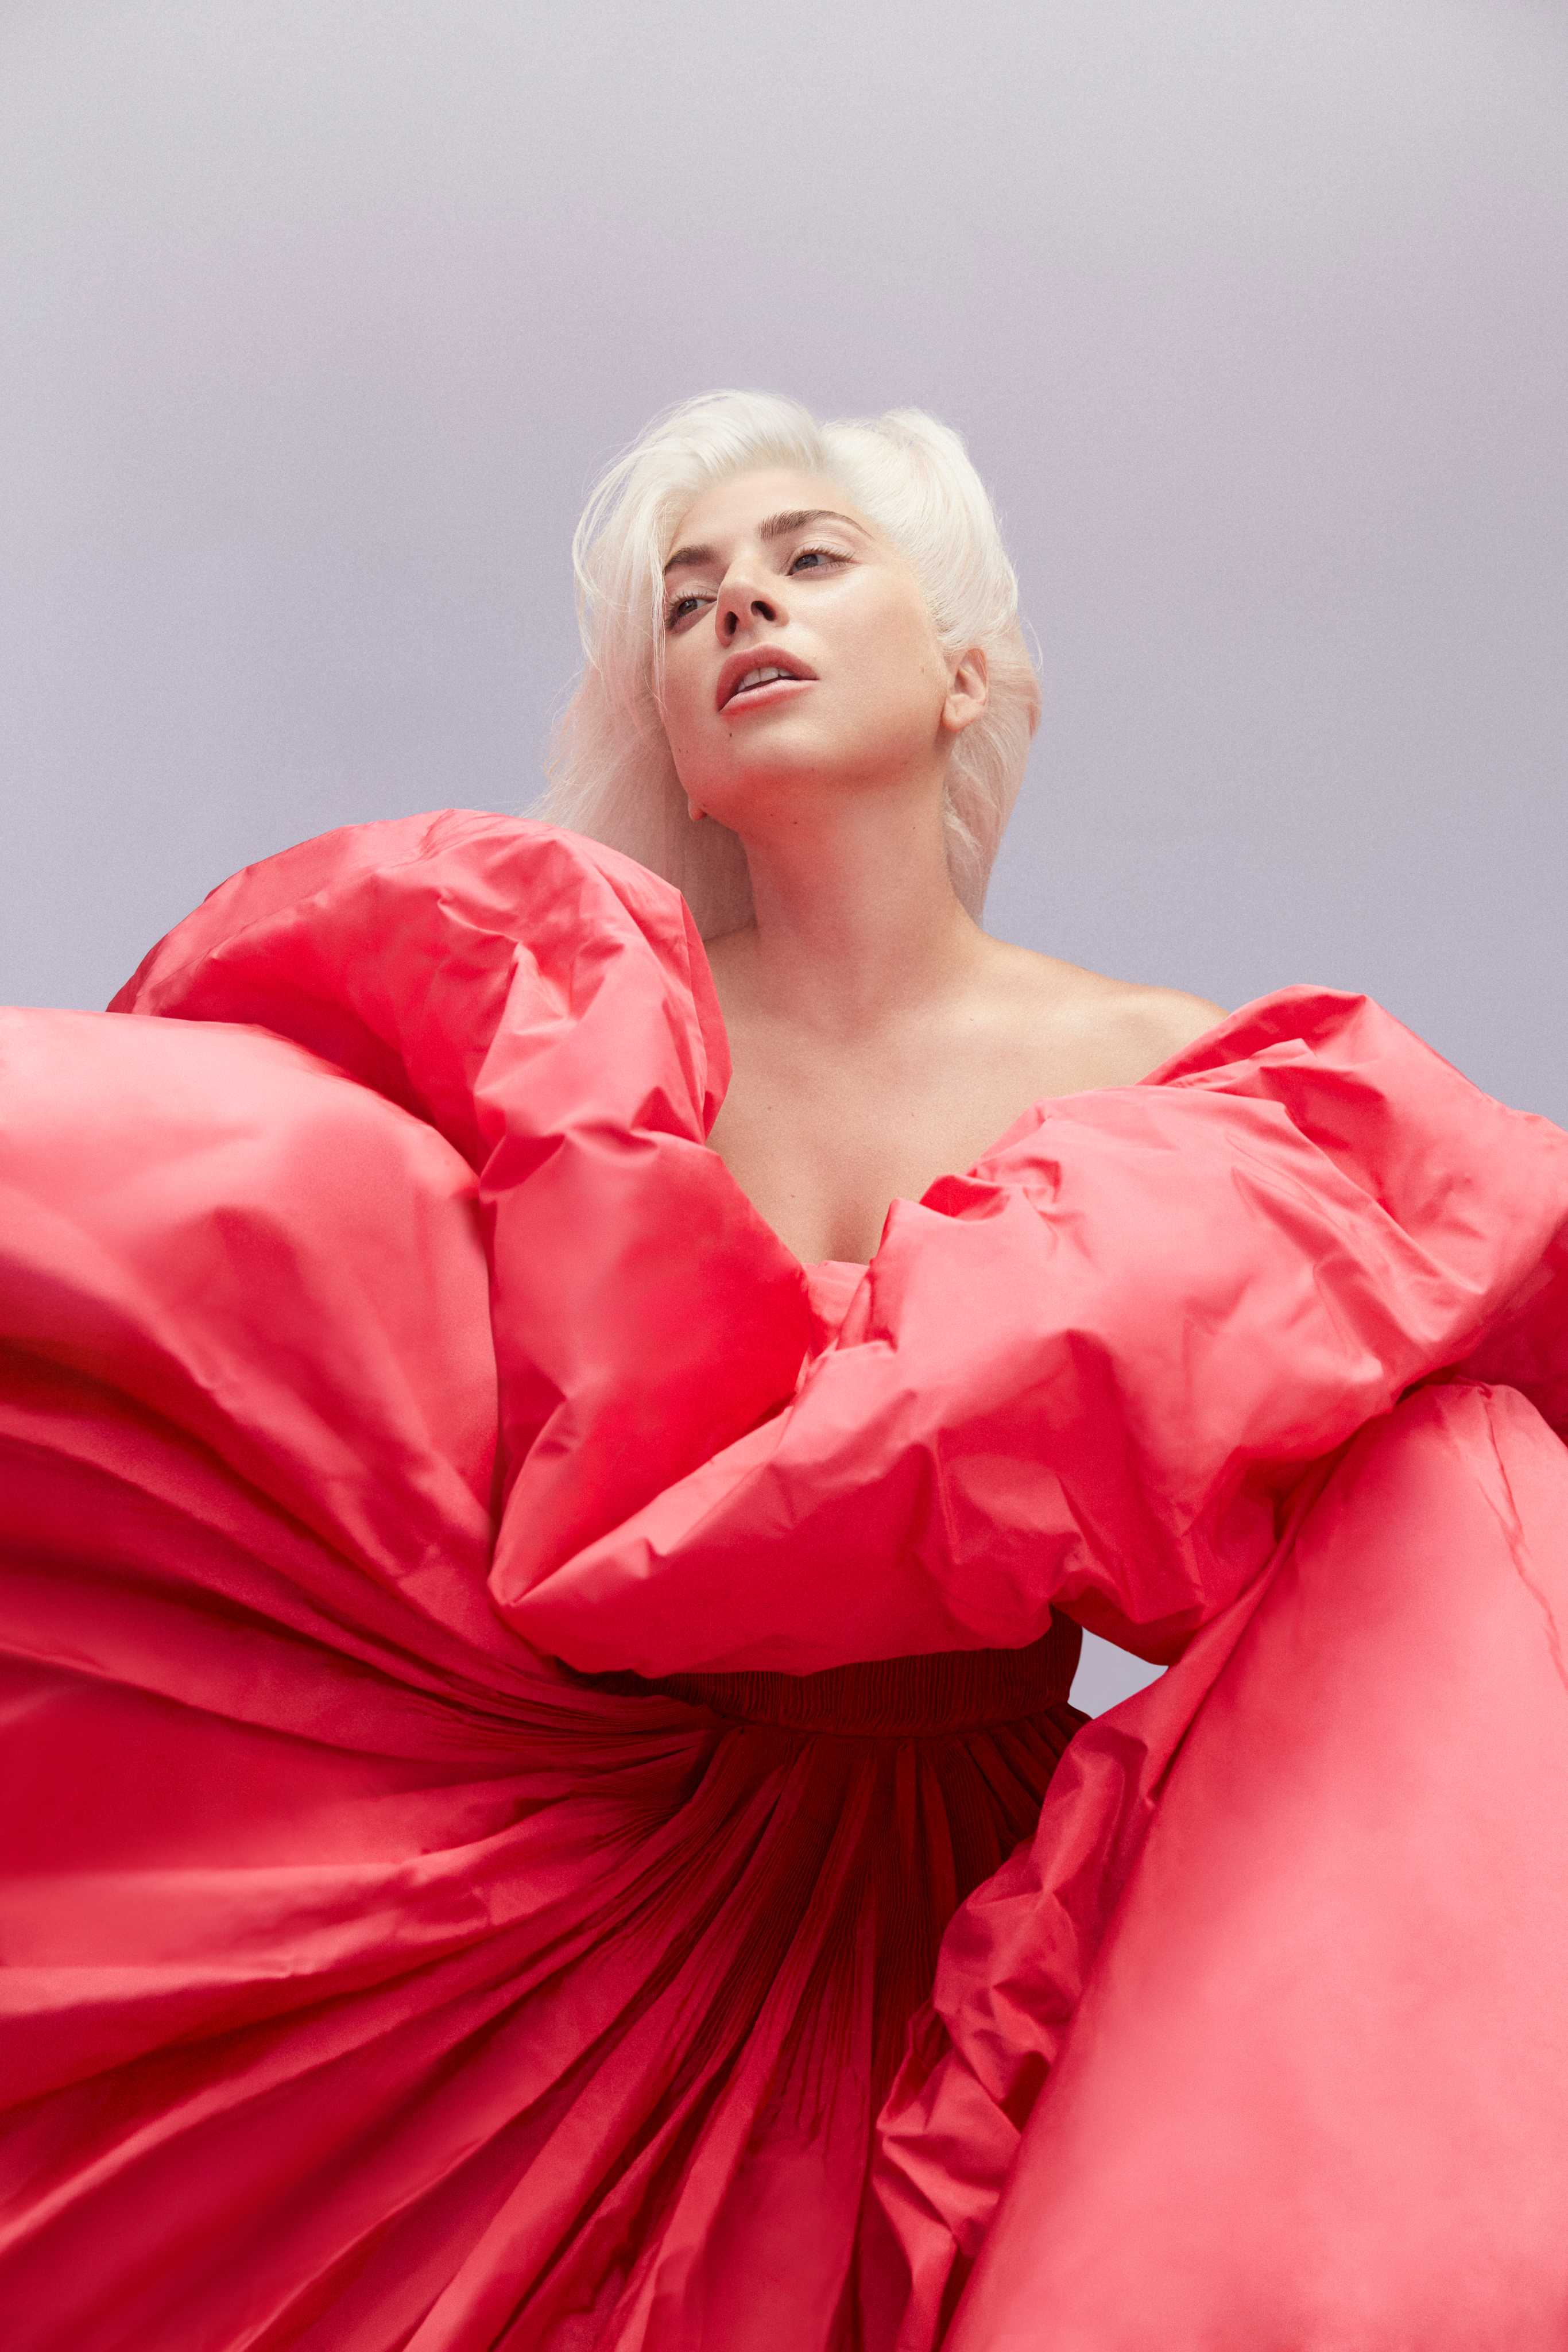 Valentino_Voce-Viva_Lady-Gaga_4-1.jpg